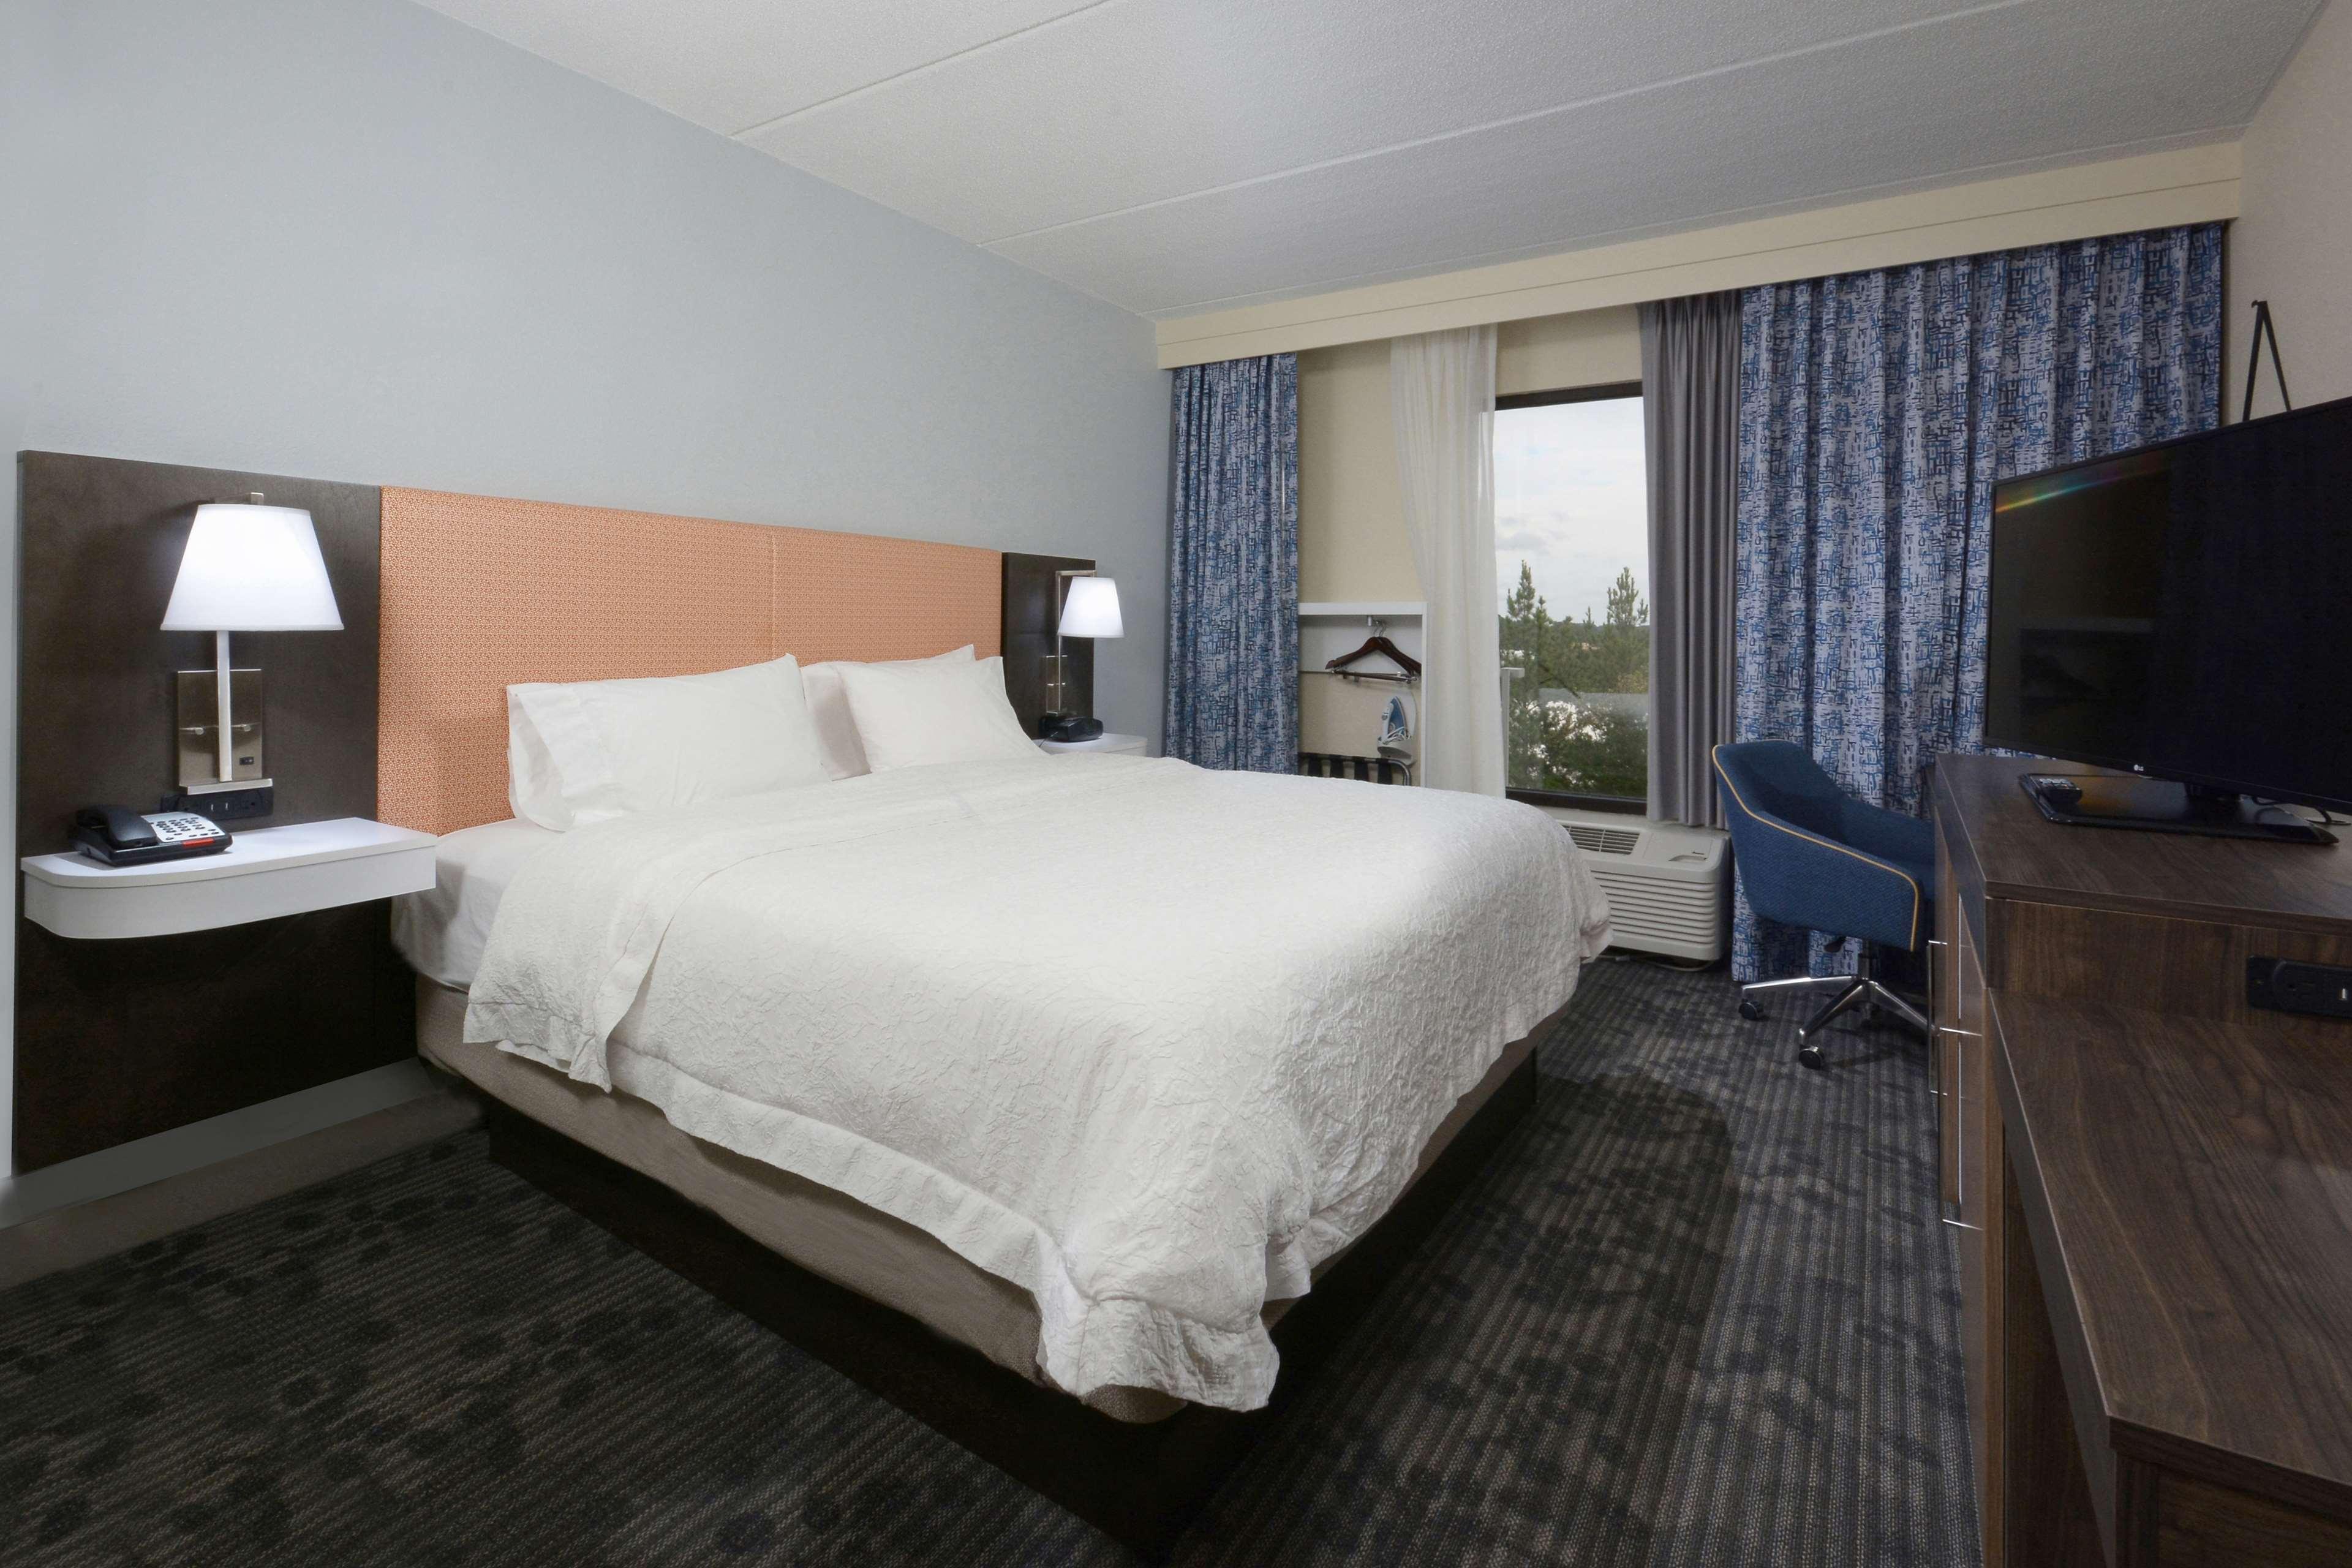 Hampton Inn & Suites Greenville/Spartanburg I-85 image 43